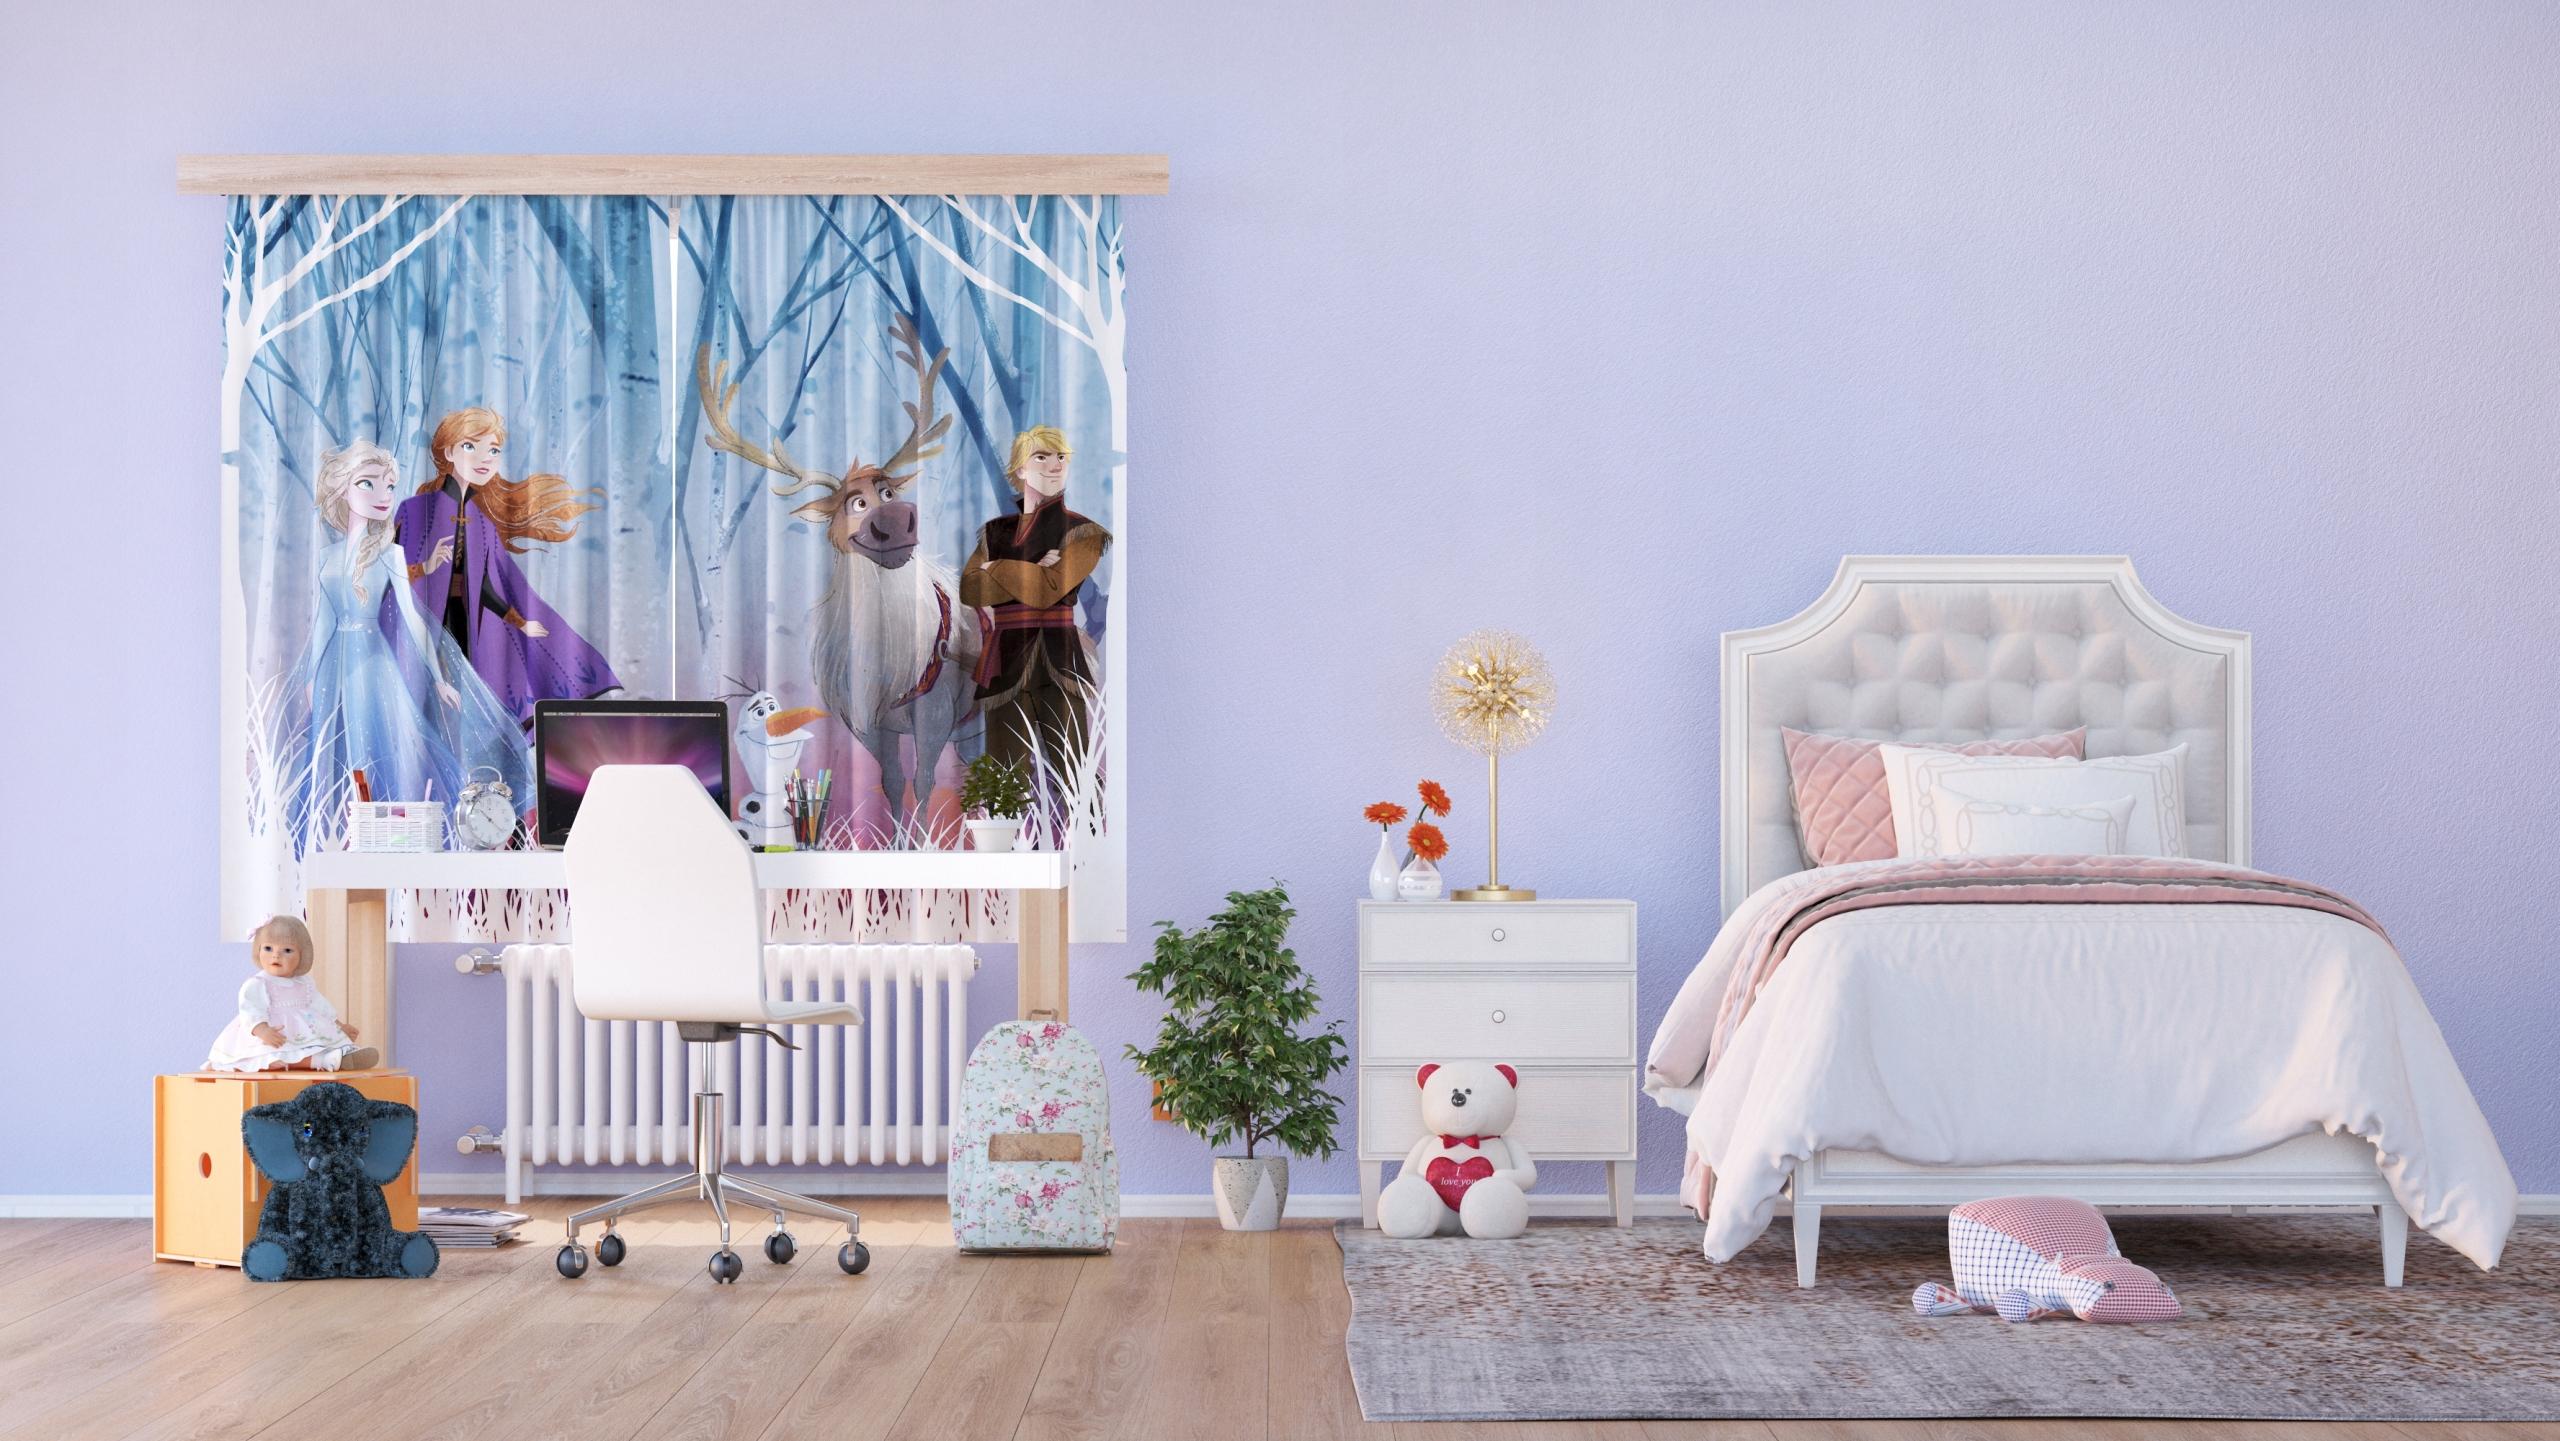 Záves Disney Frozen 2, dizajn 180 x 160 -AG